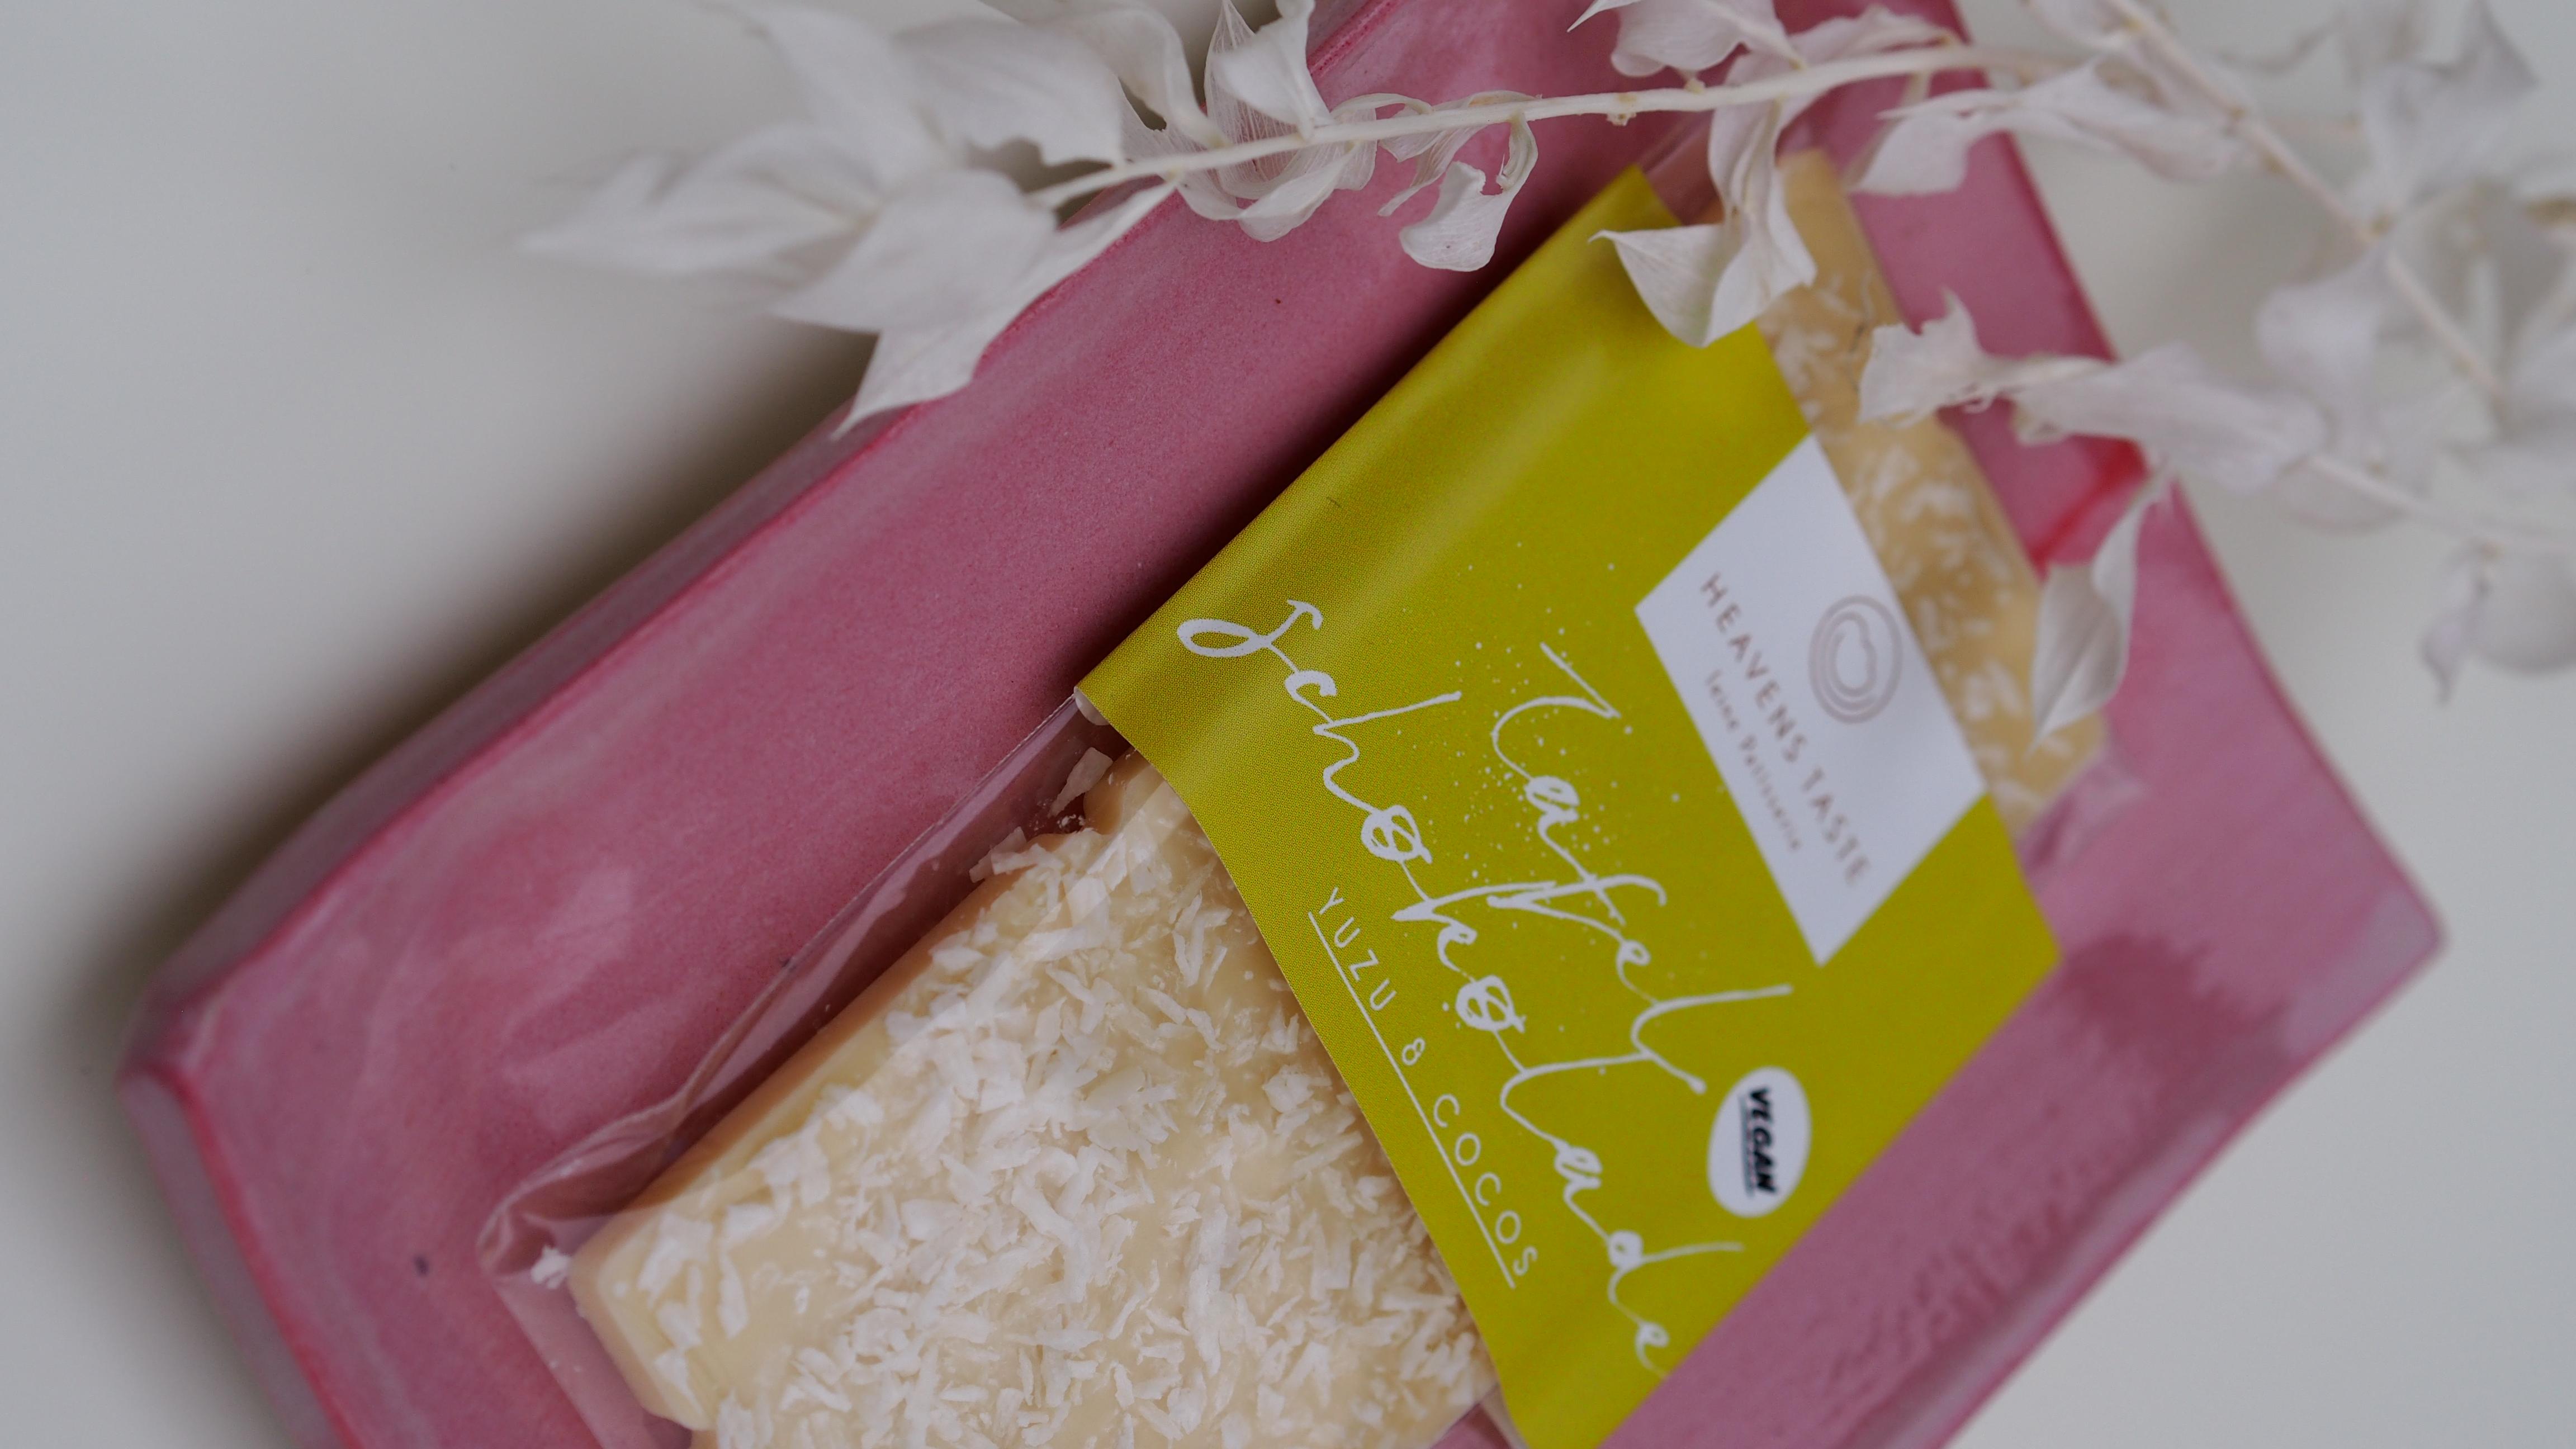 Tafelschokolade Yuzu & Cocos VEGAN, 50 Gramm